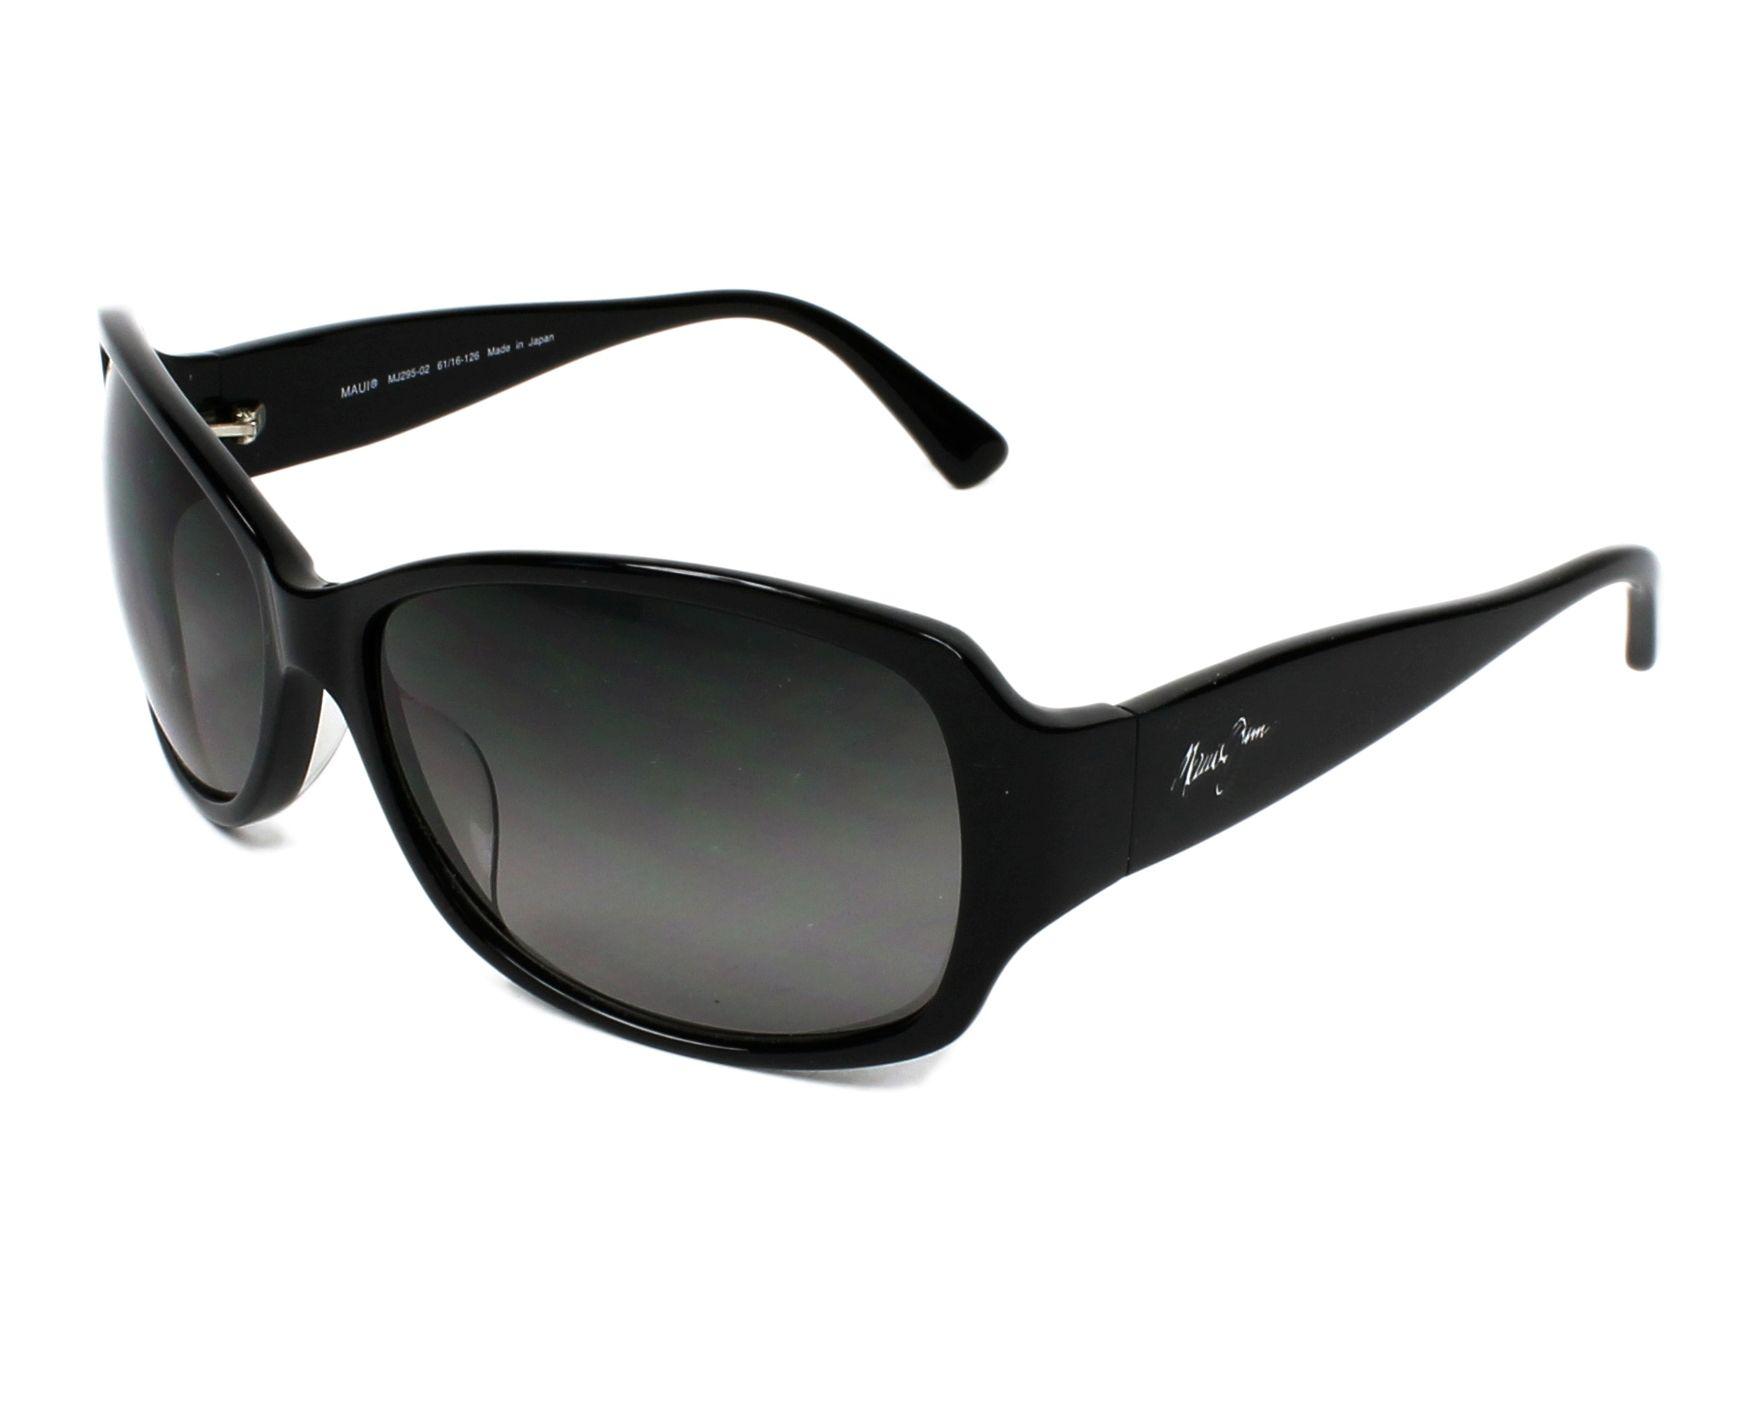 fa969f047d2a Sunglasses Maui Jim GS-295 02 - Black profile view